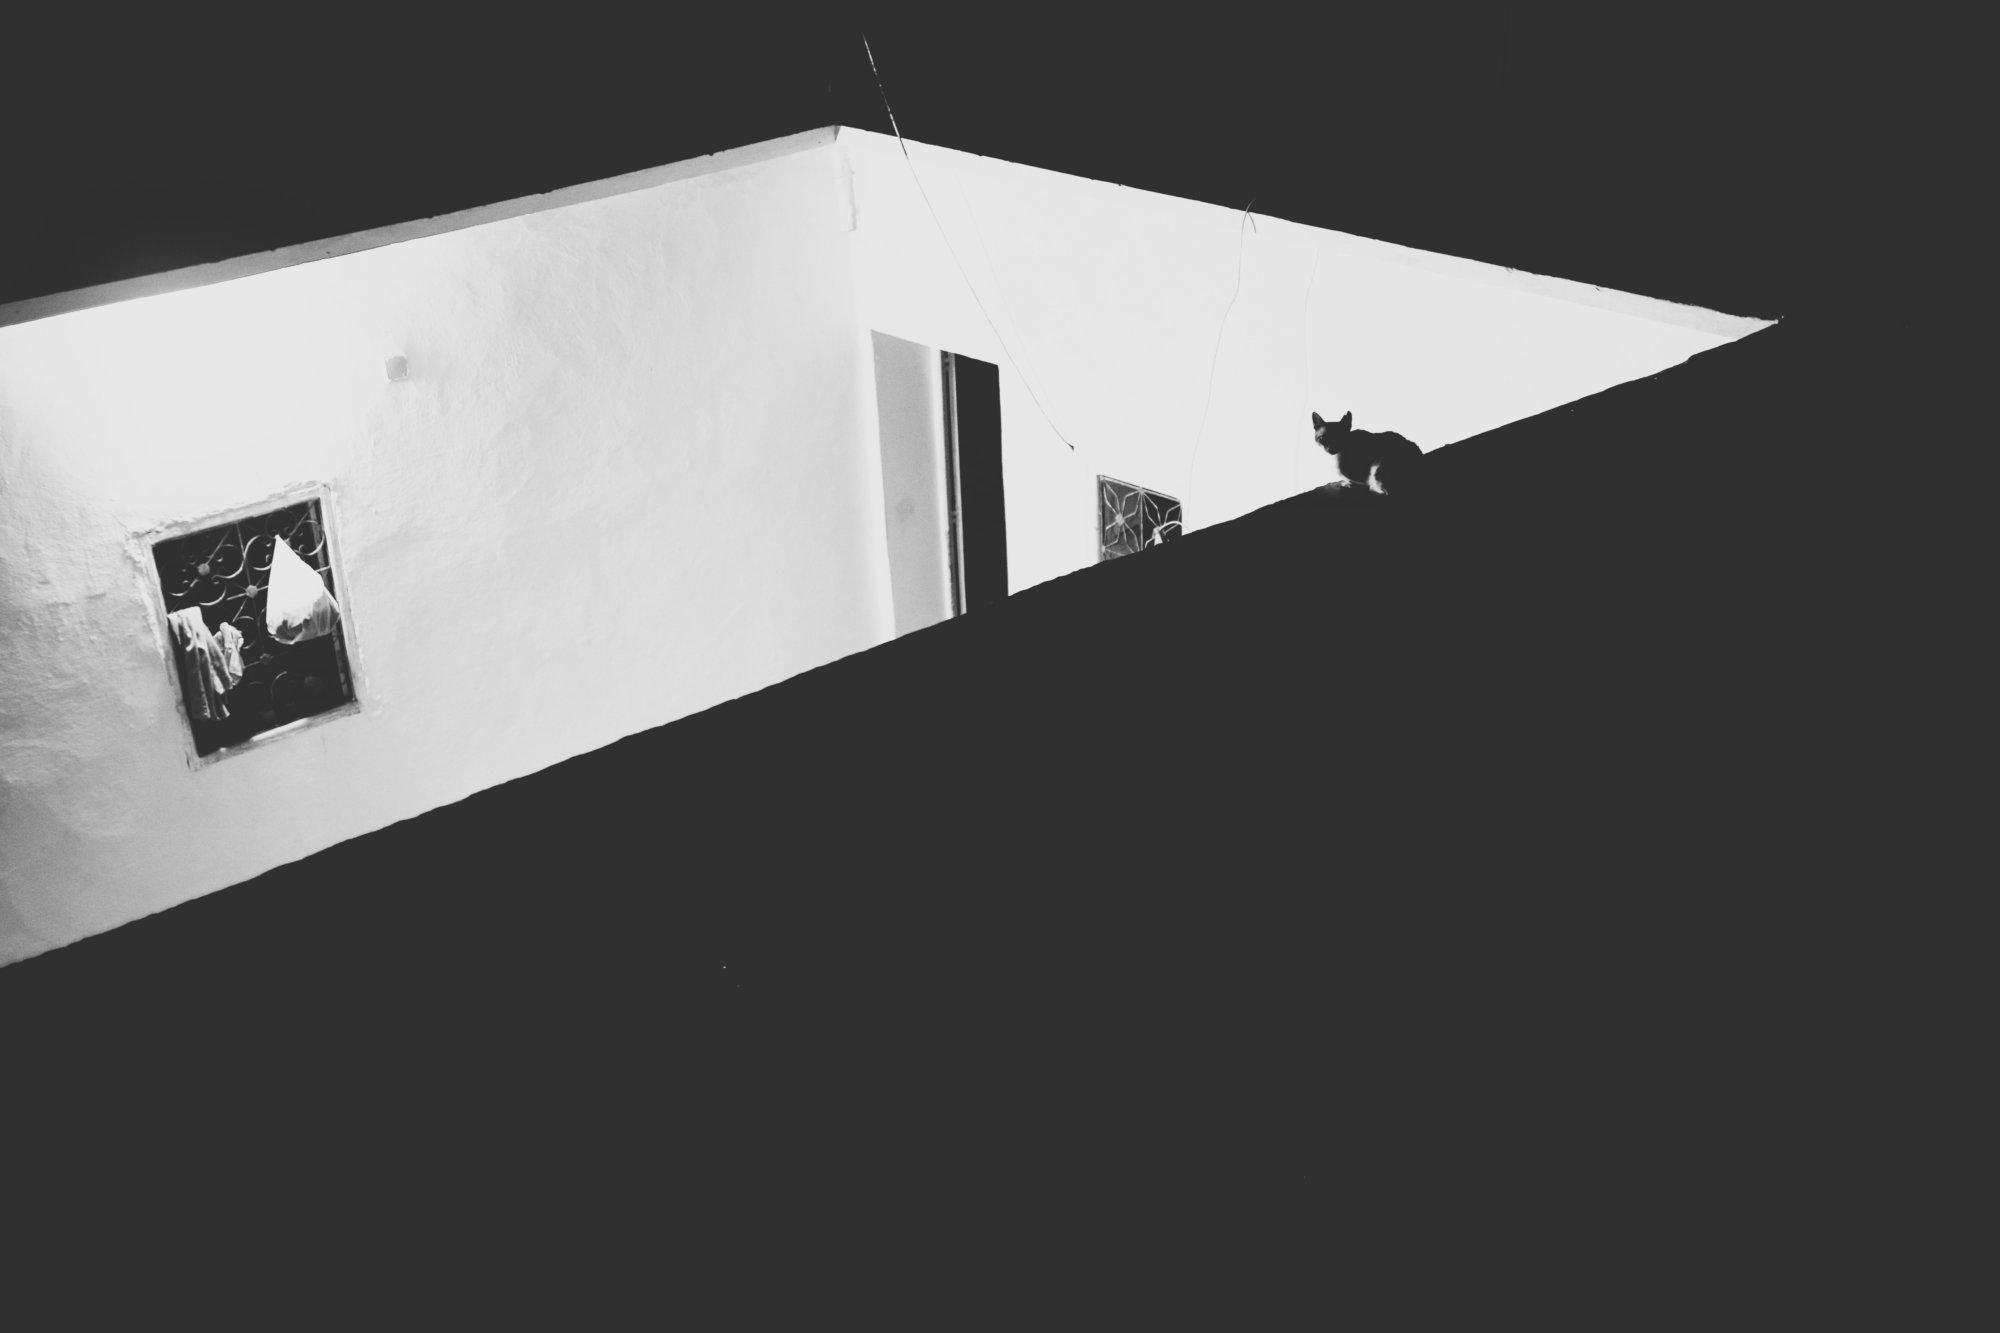 security-cat-on-duty-taroudant-marokko-2016-mcu-ausflug